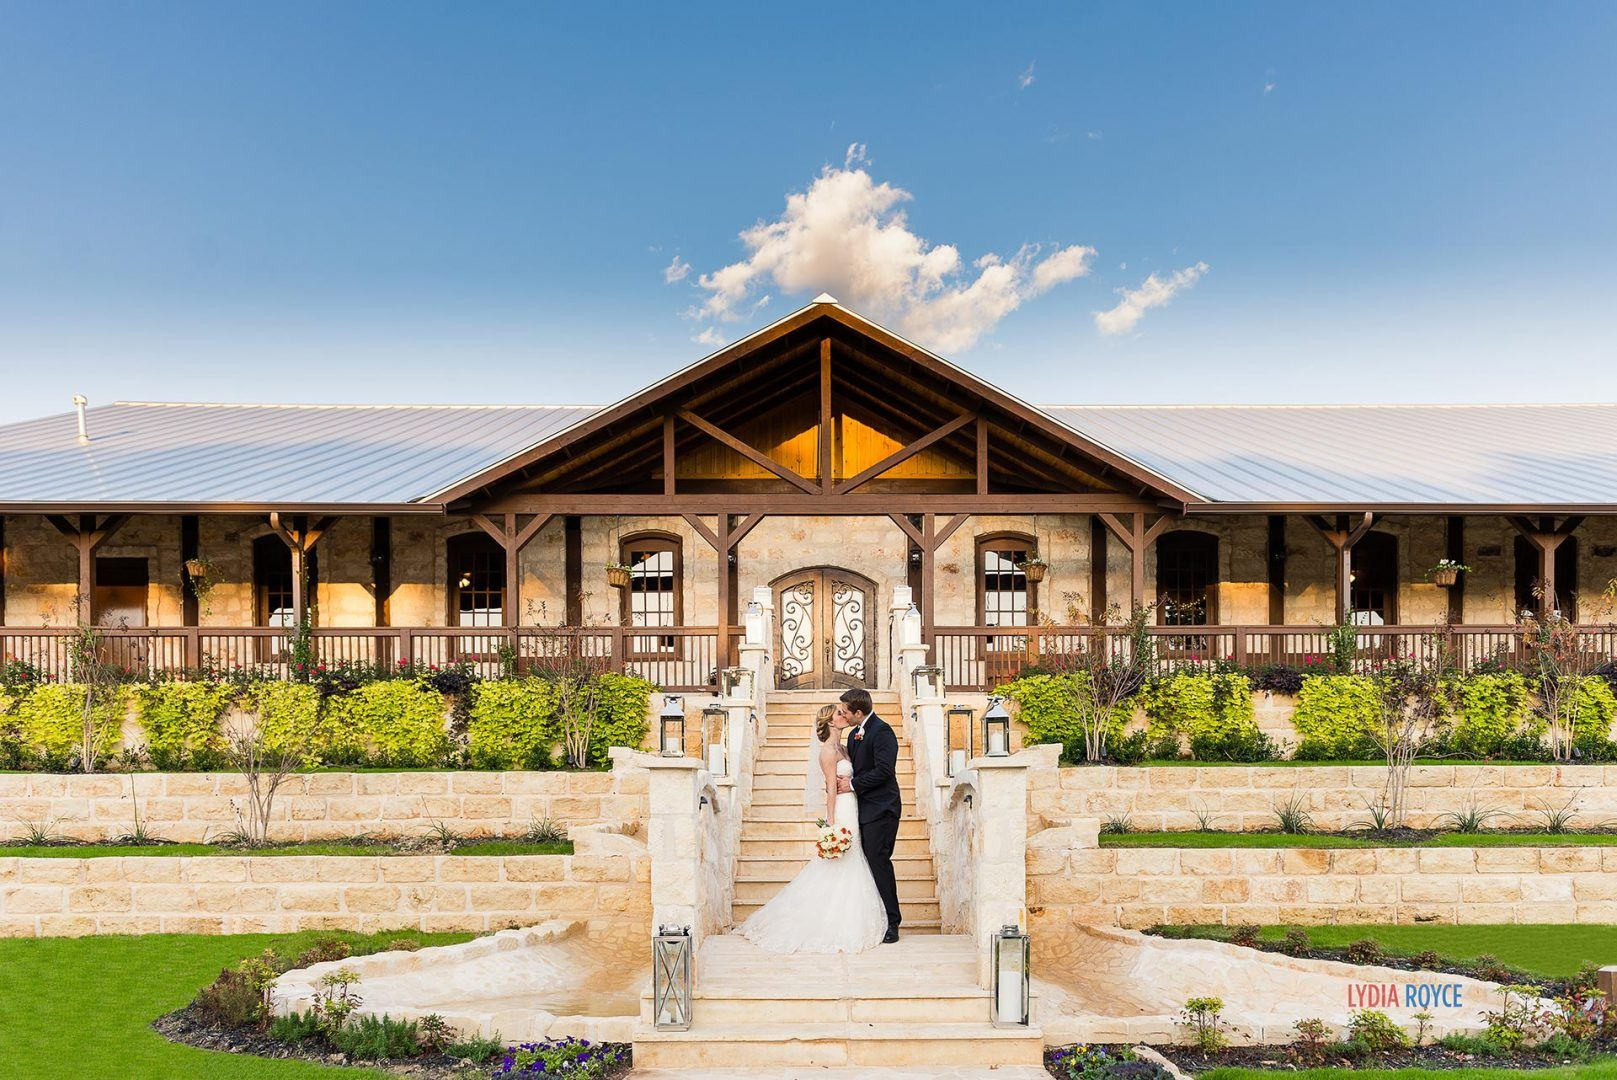 Dallas Wedding Venues | Dallas wedding venues, Wedding ...